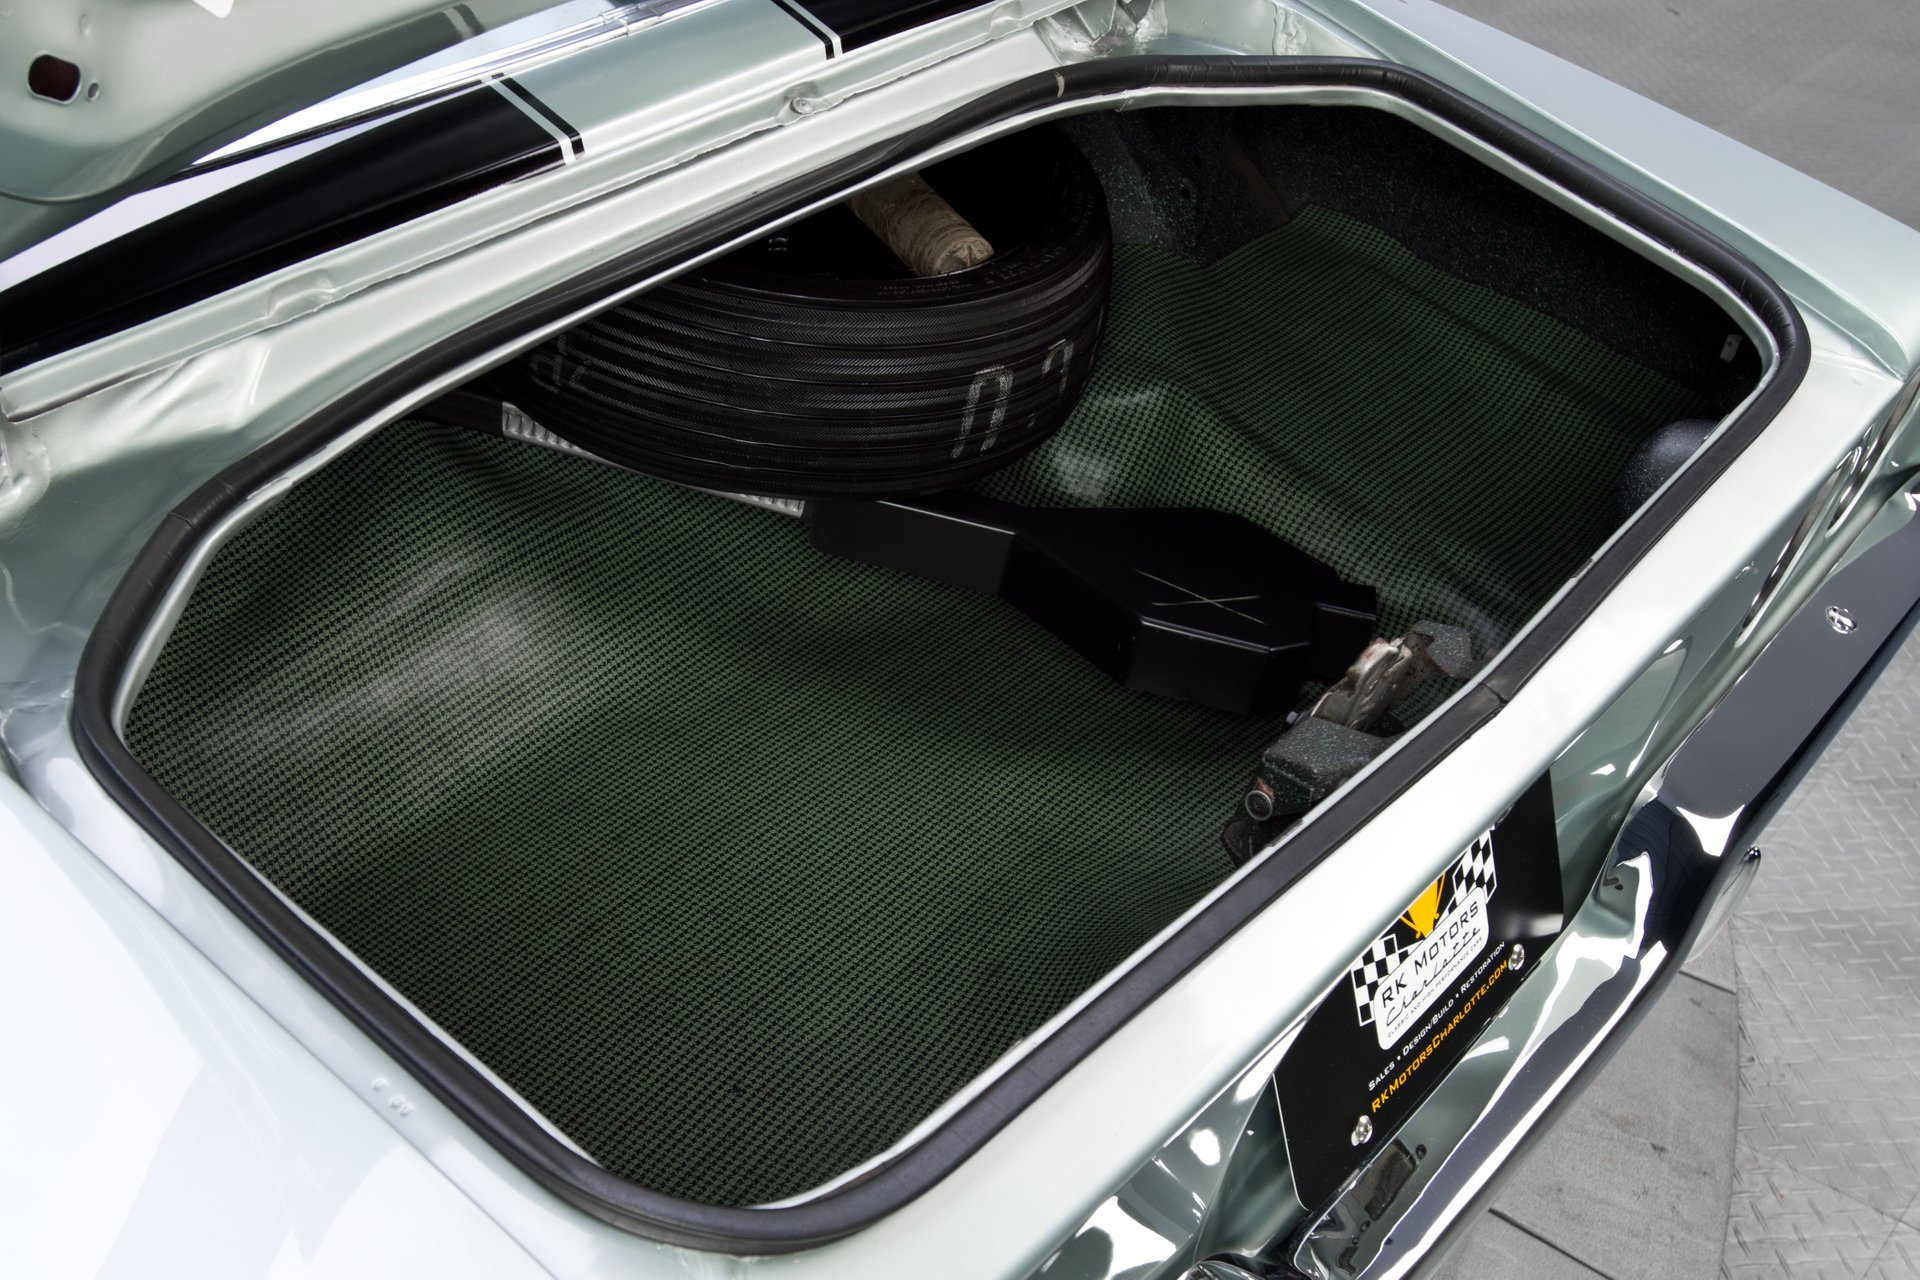 134271 1971 Chevrolet Camaro RK Motors Classic Cars for Sale